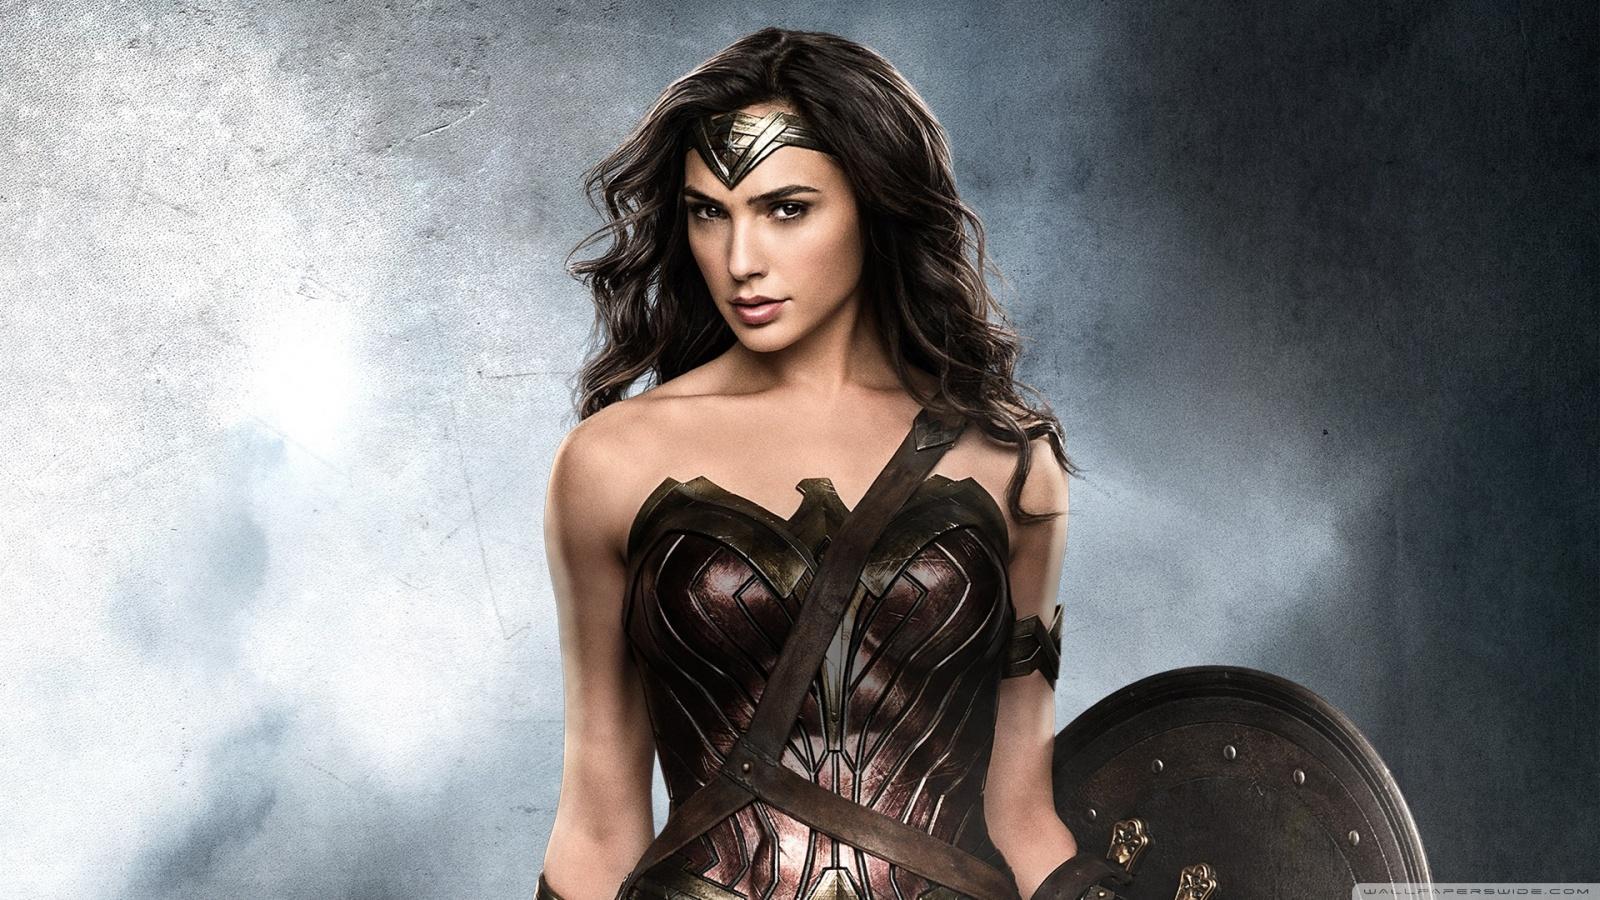 Wonder Woman Movie 4k Hd Desktop Wallpaper For 4k Ultra Hd Tv: Top Free Gal Gadot Backgrounds